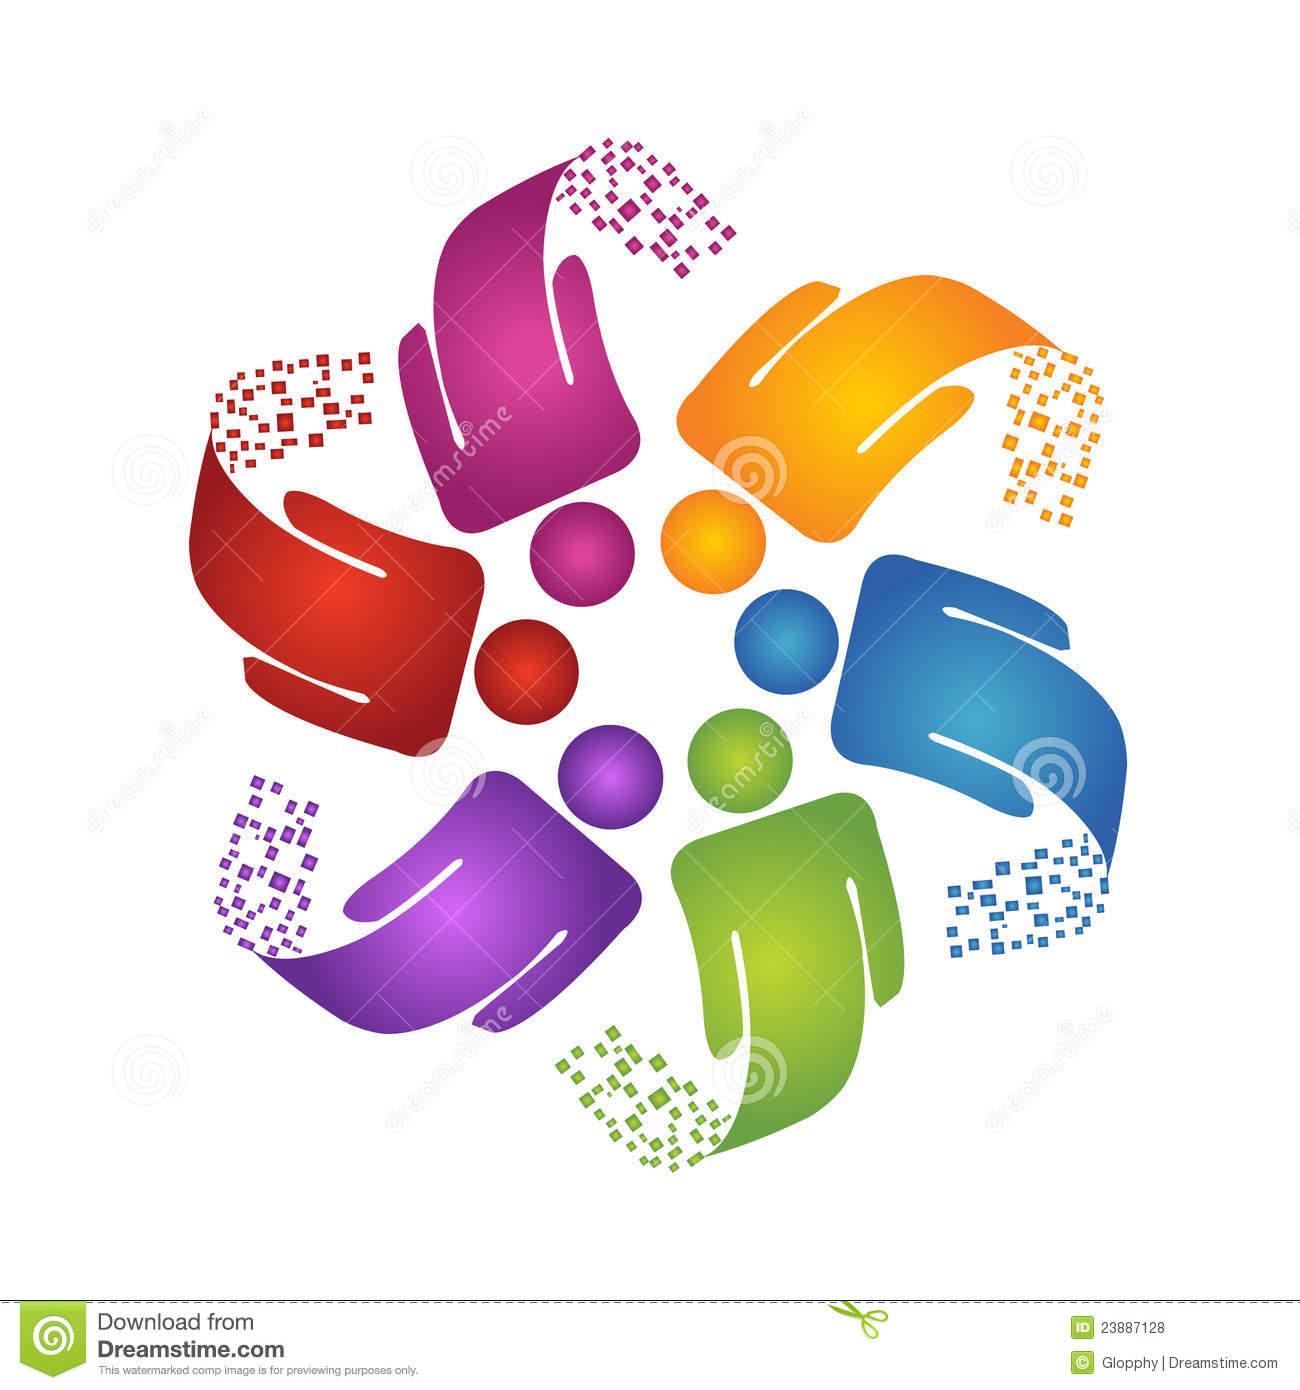 Teamwork Logo Design Free